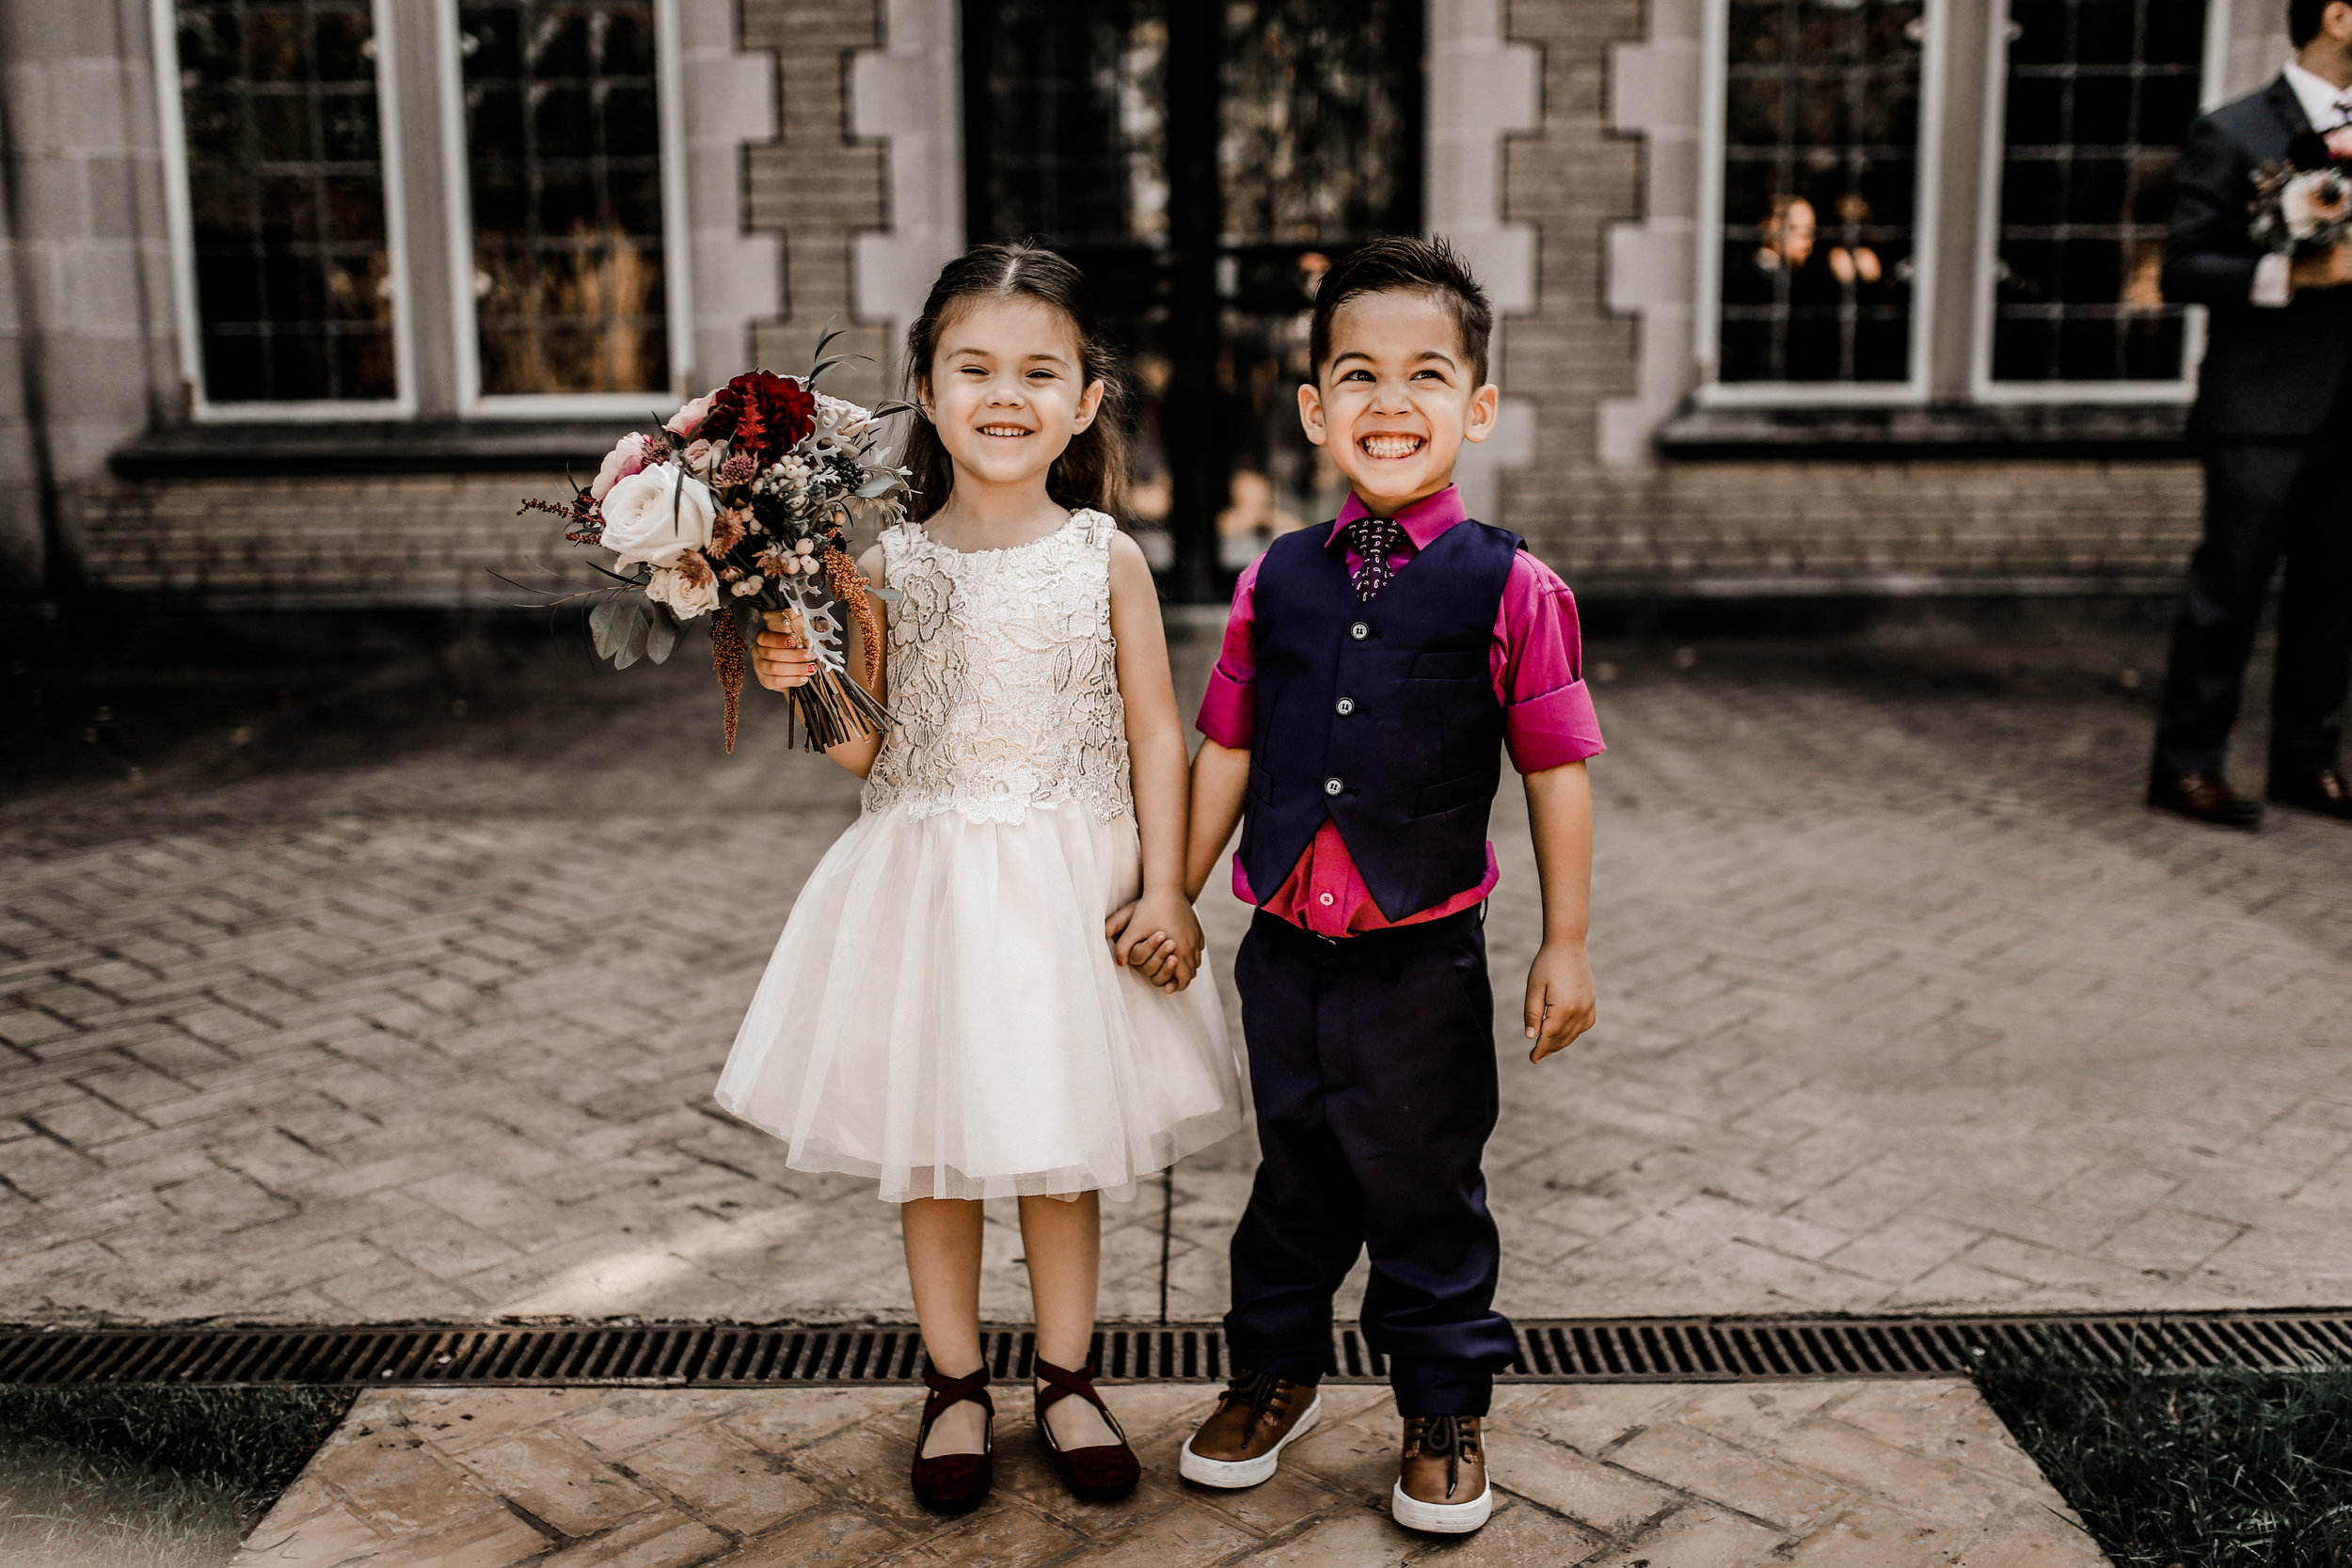 LDP_McNeiveWedding_WeddingParty_052.JPG